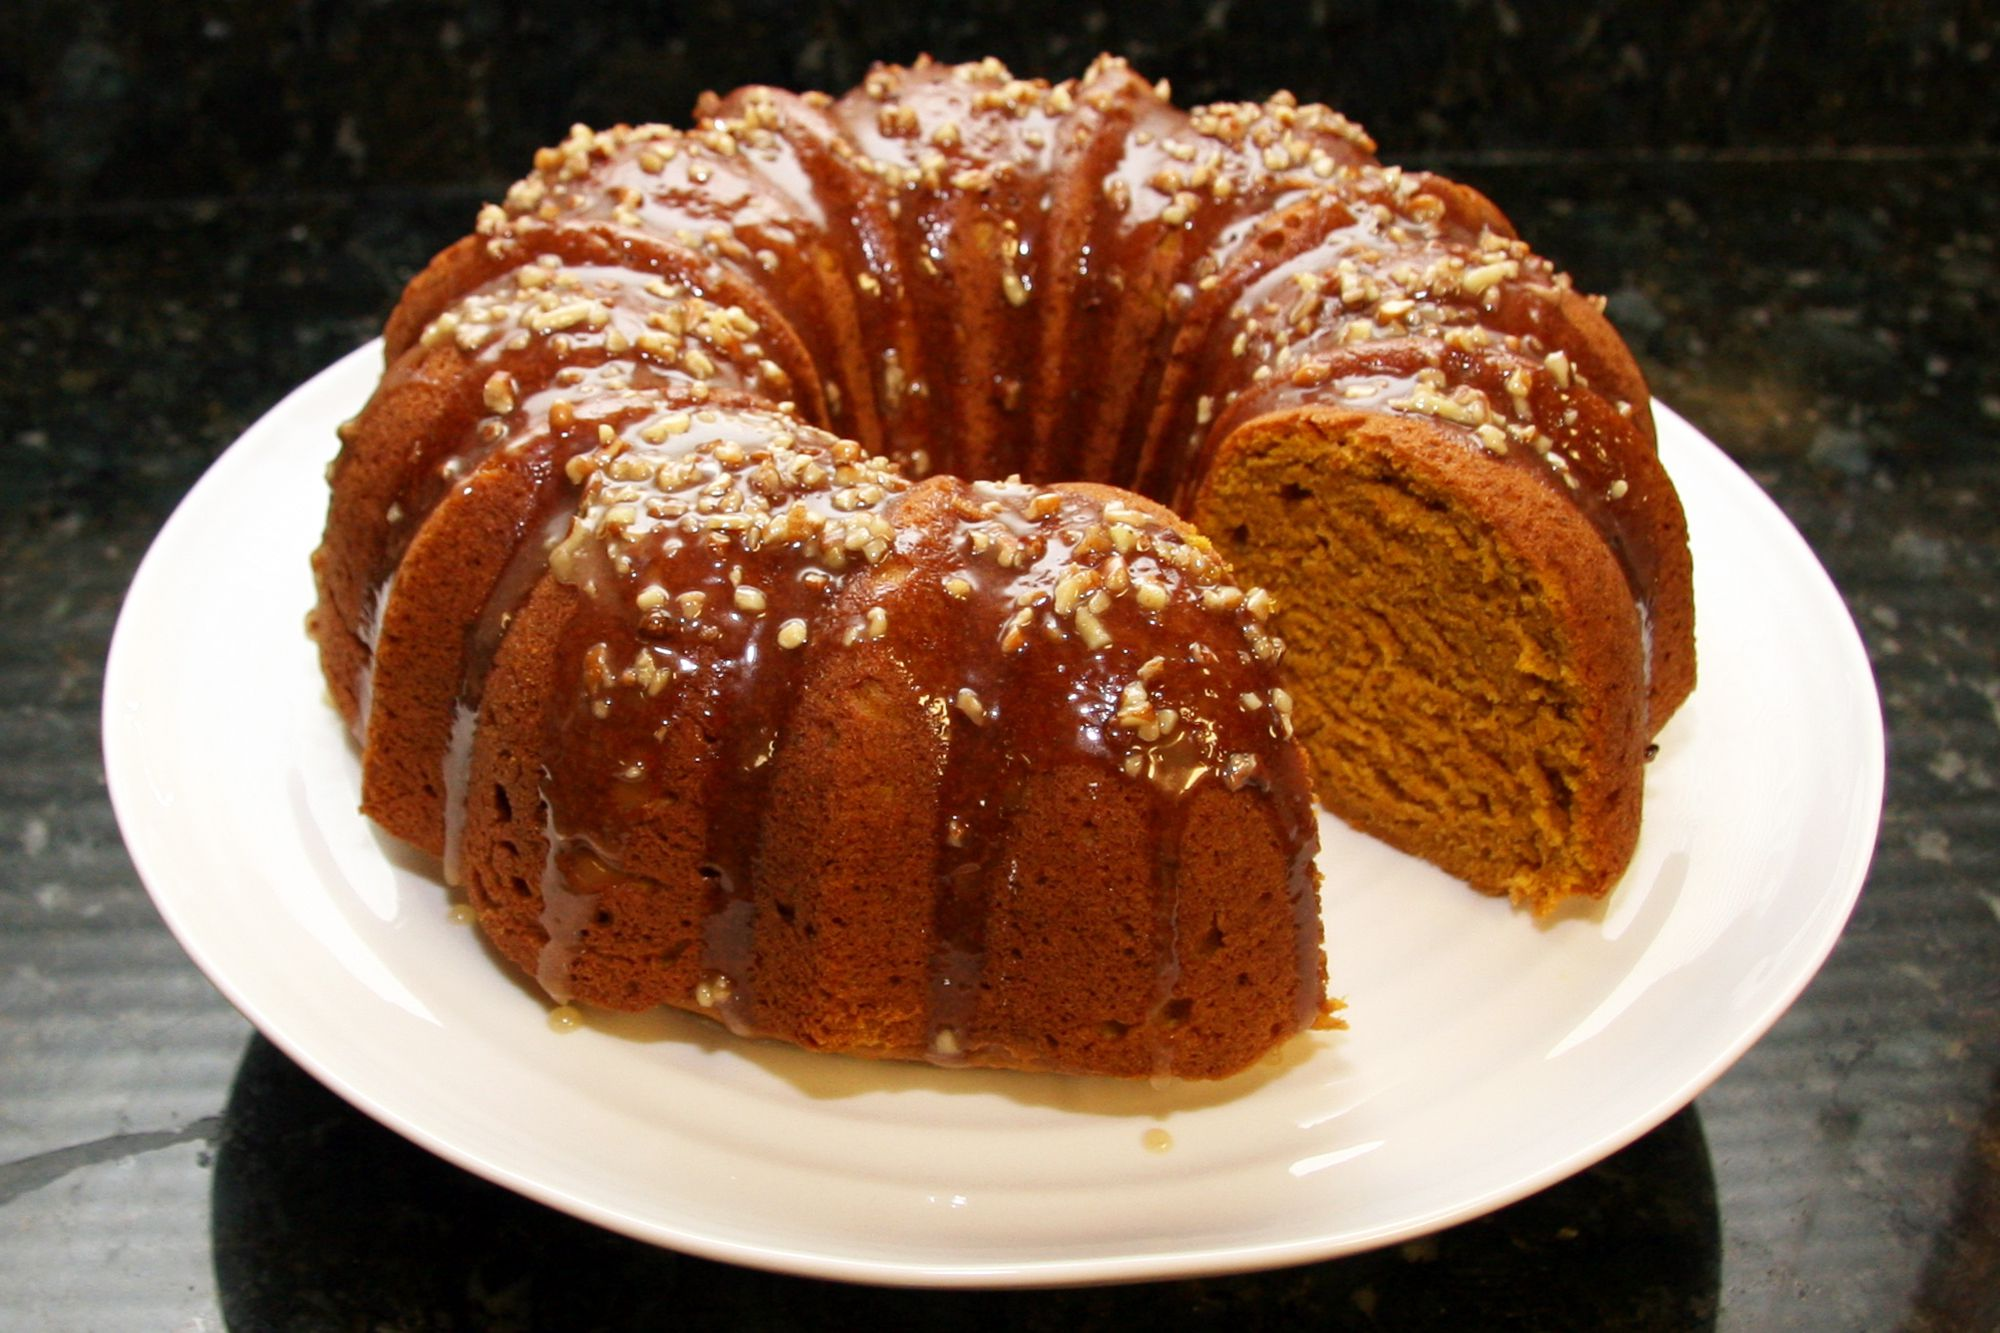 Japanese Pumpkin Cake Recipe: Pumpkin Pound Cake Recipe With Maple Pecan Glaze